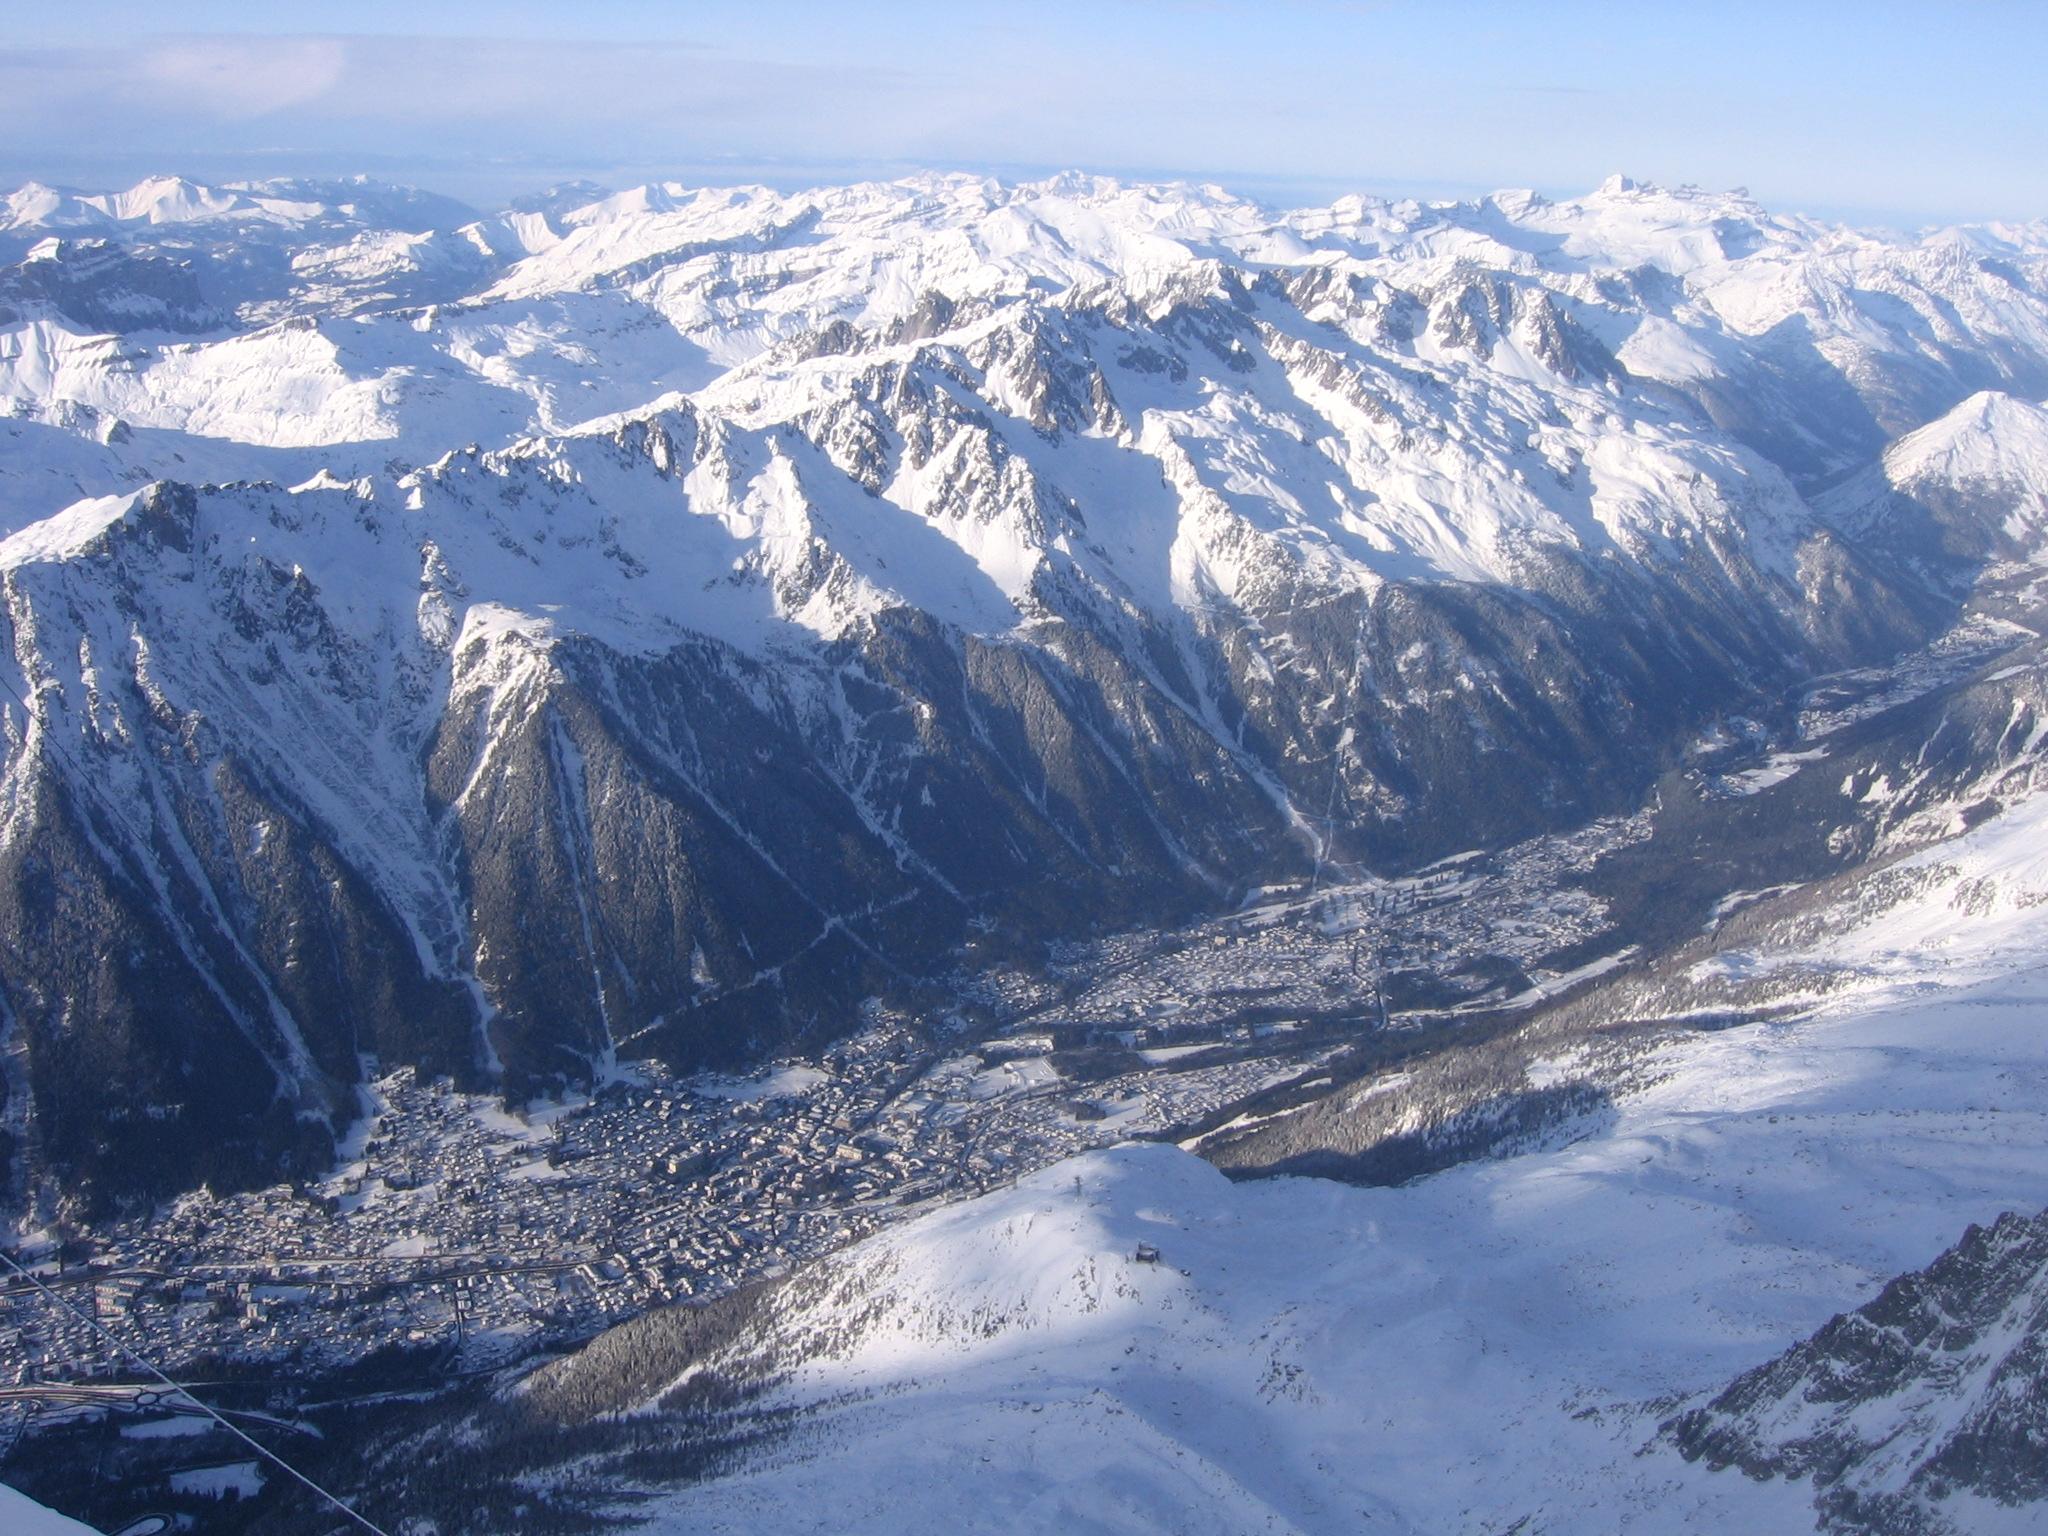 Chamonix valley from the Aiguille de Midi